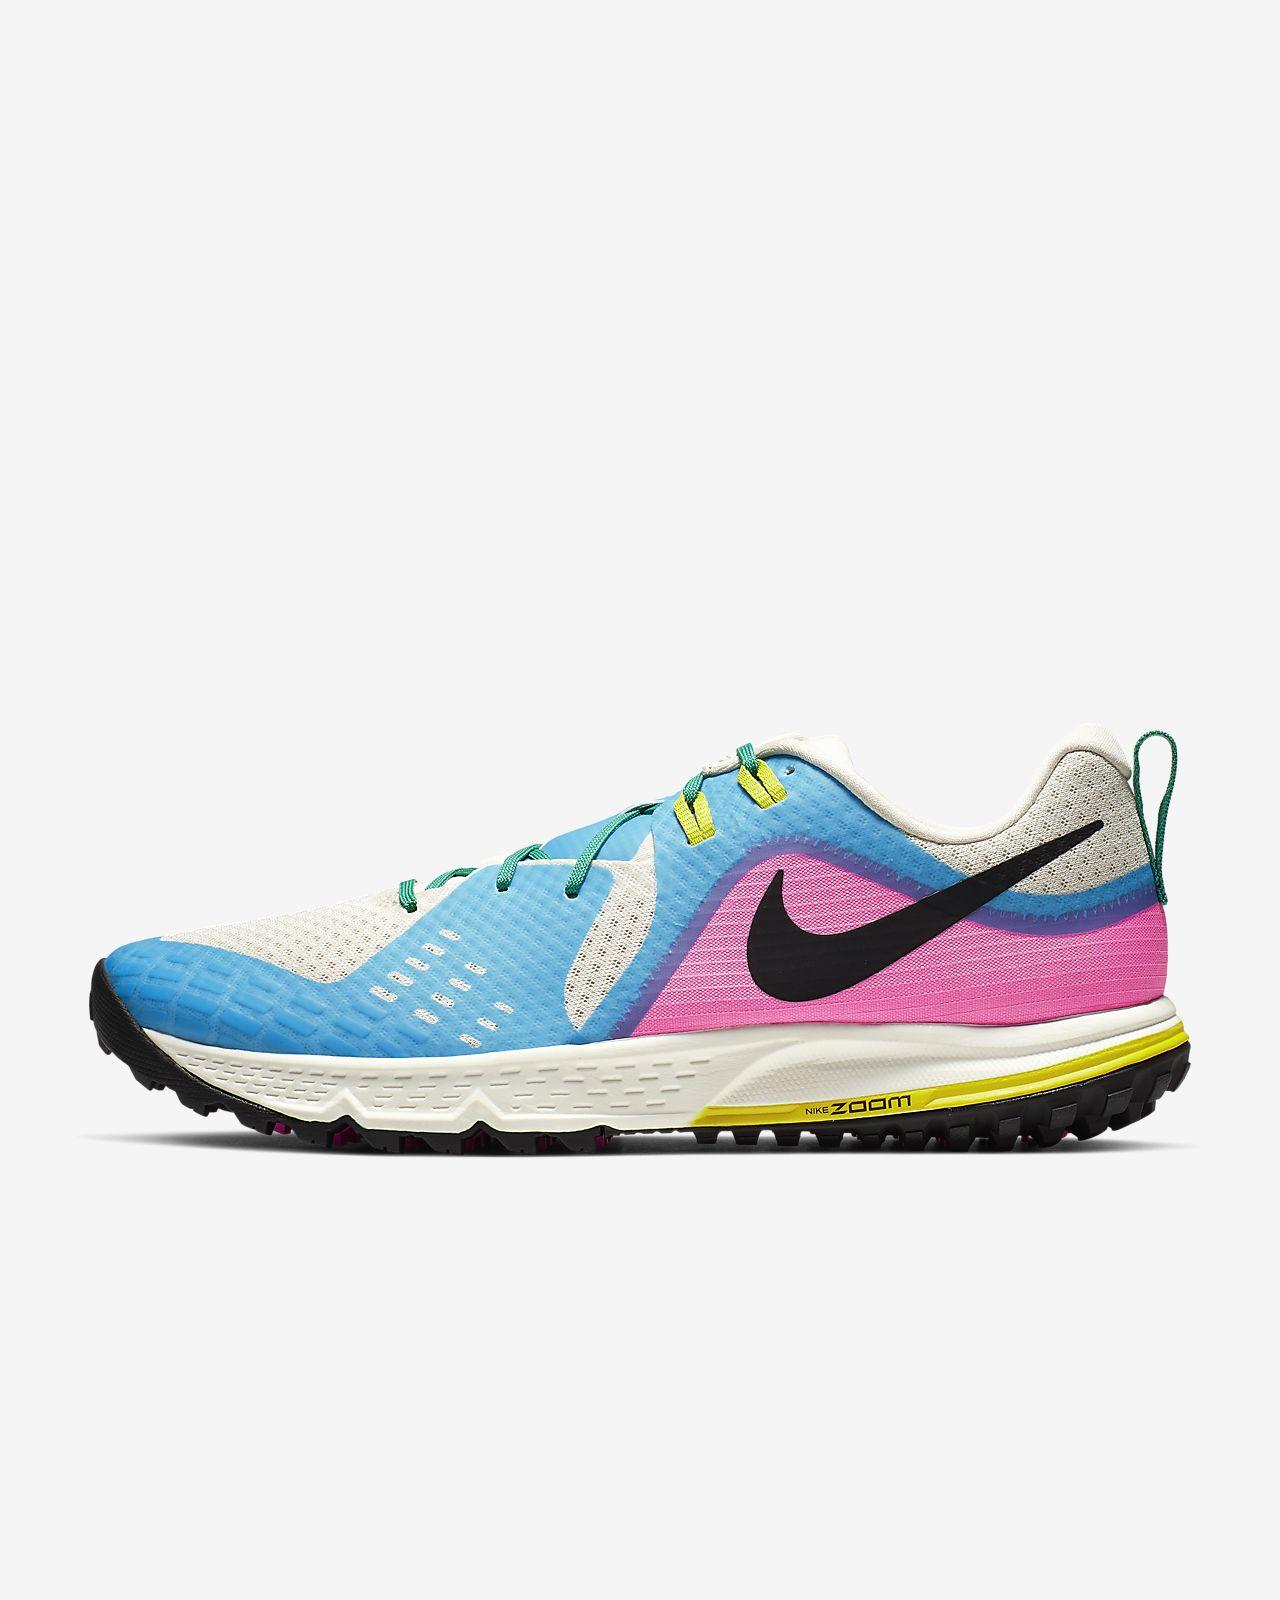 Nike Air Zoom Wildhorse 5 Men's Running Shoe